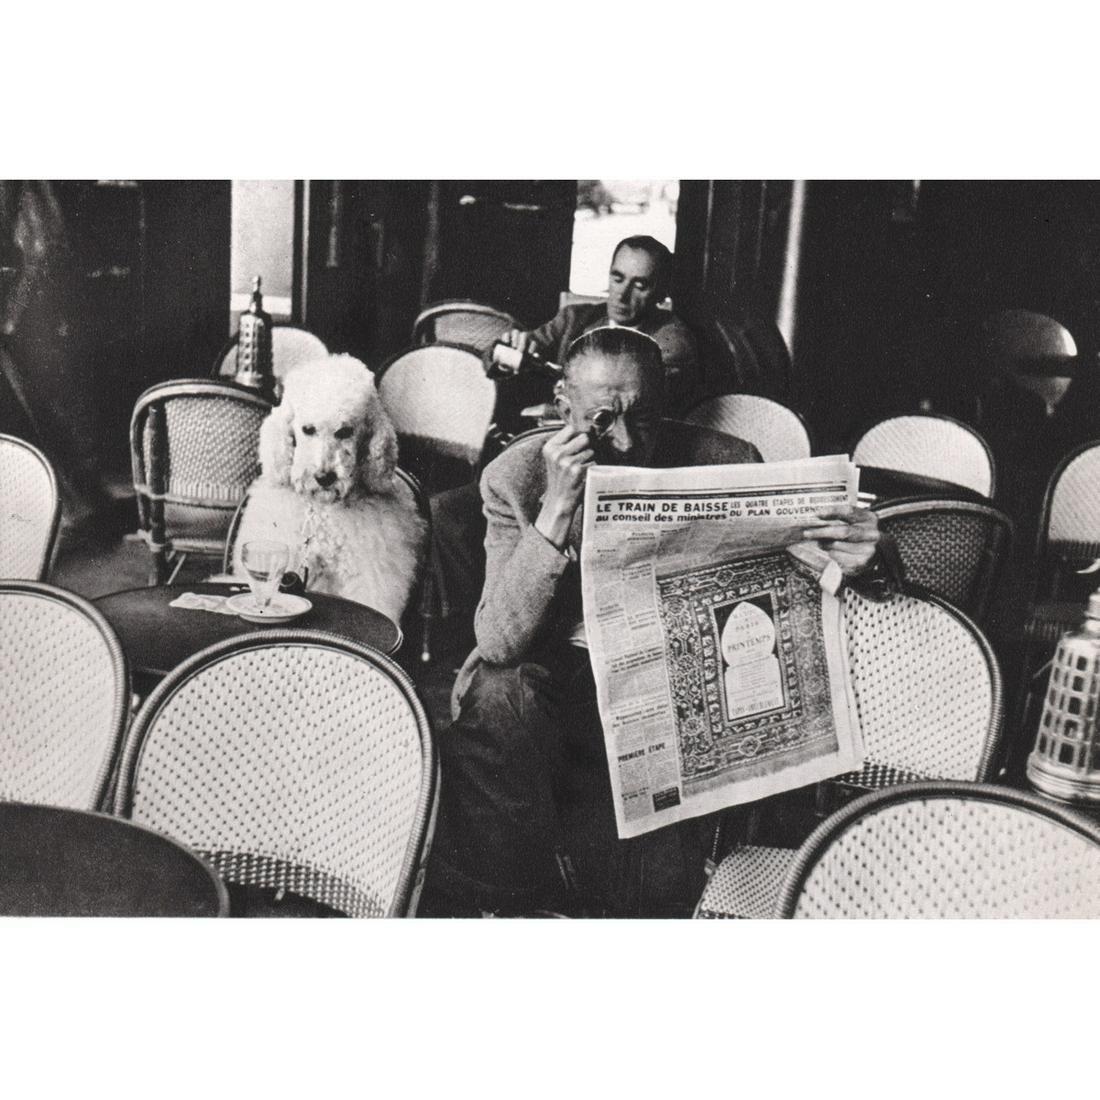 EDOUARD BOUBAT - Paris, 1953